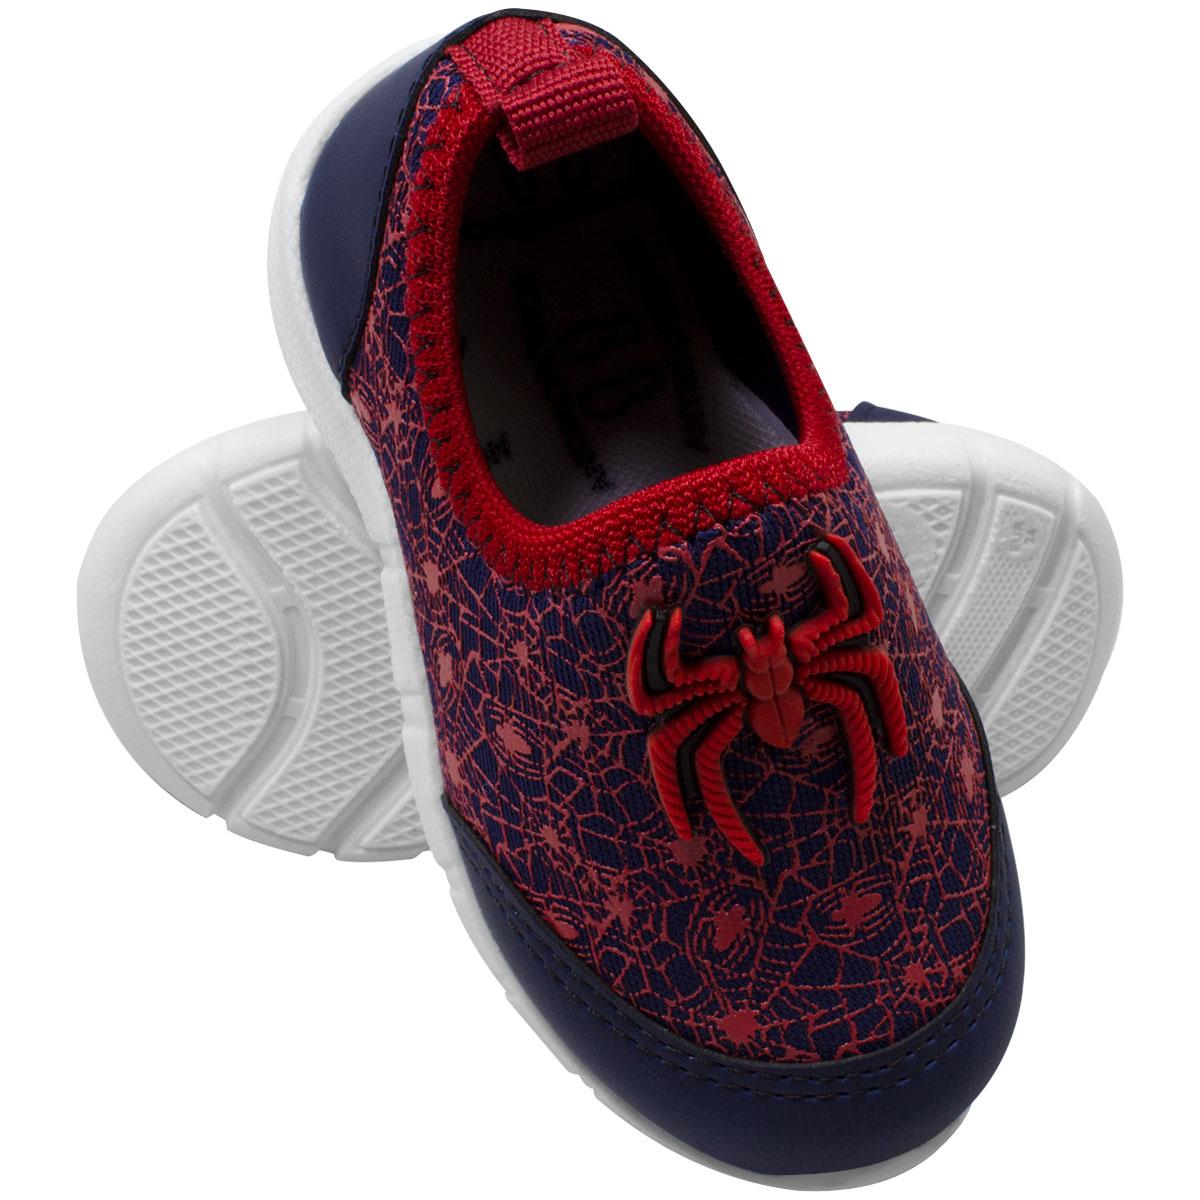 Tênis infantil masculino calce fácil aranha herói jogging 402-53-45